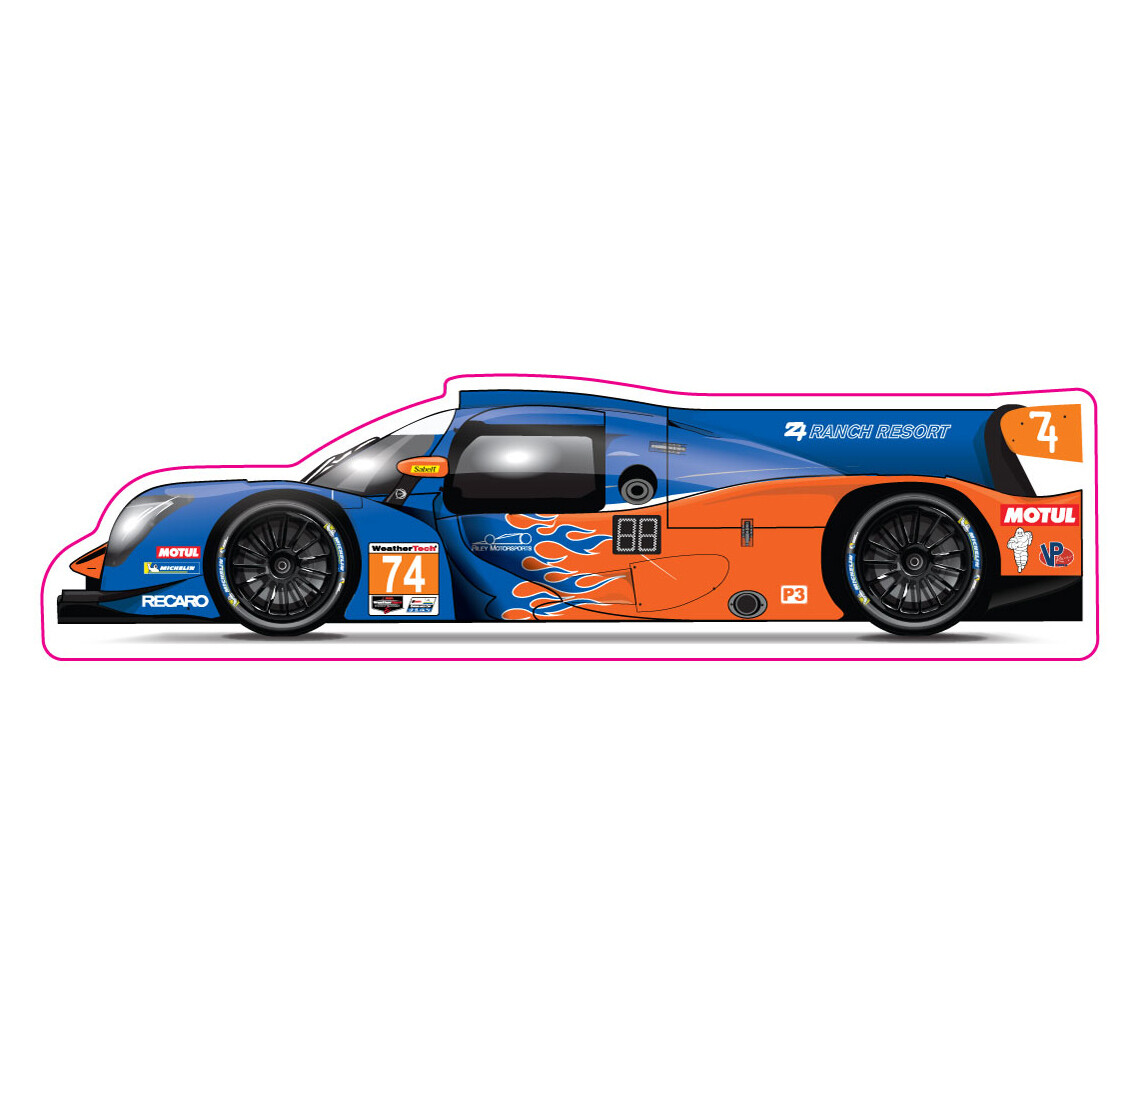 Decal - Riley MotorSports